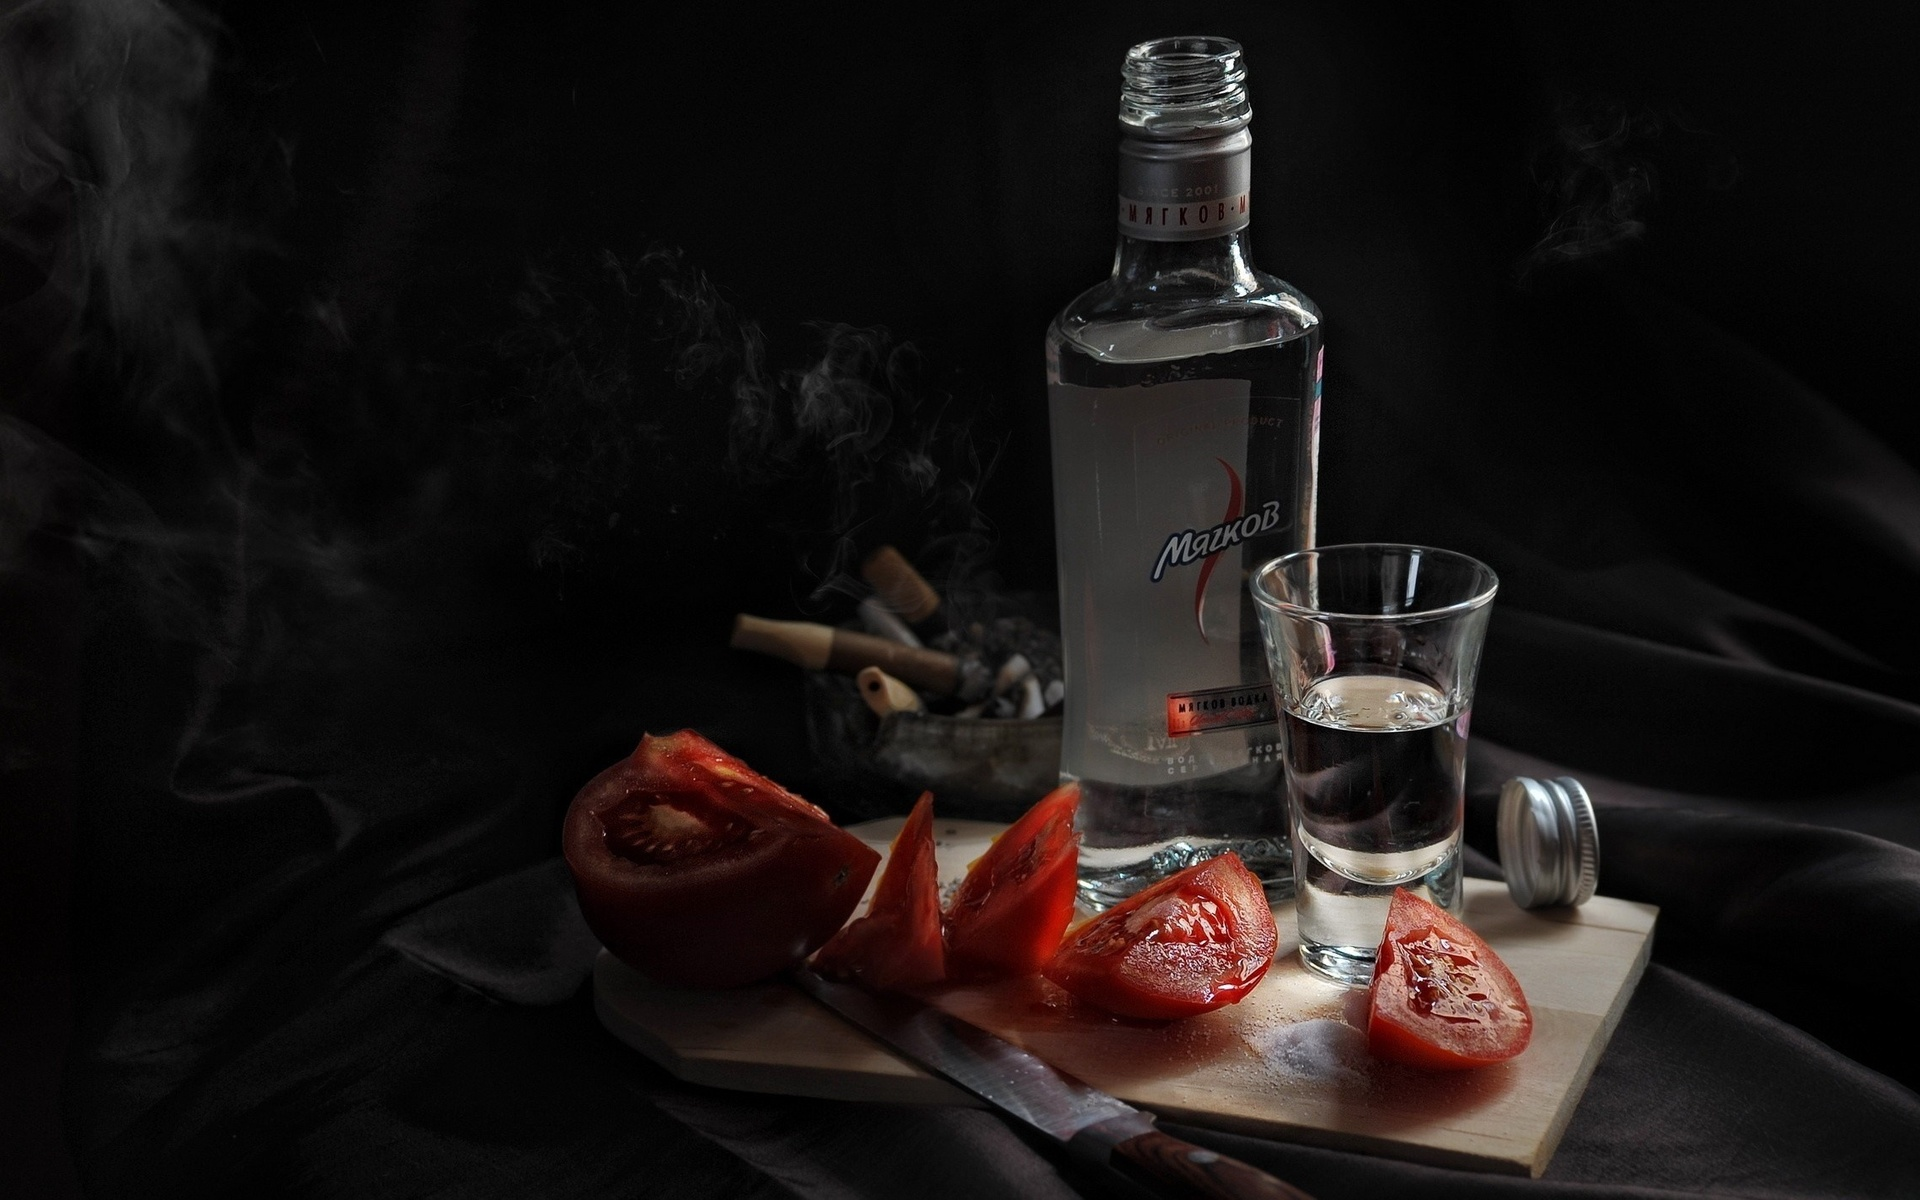 Картинка бутылка и рюмка водки